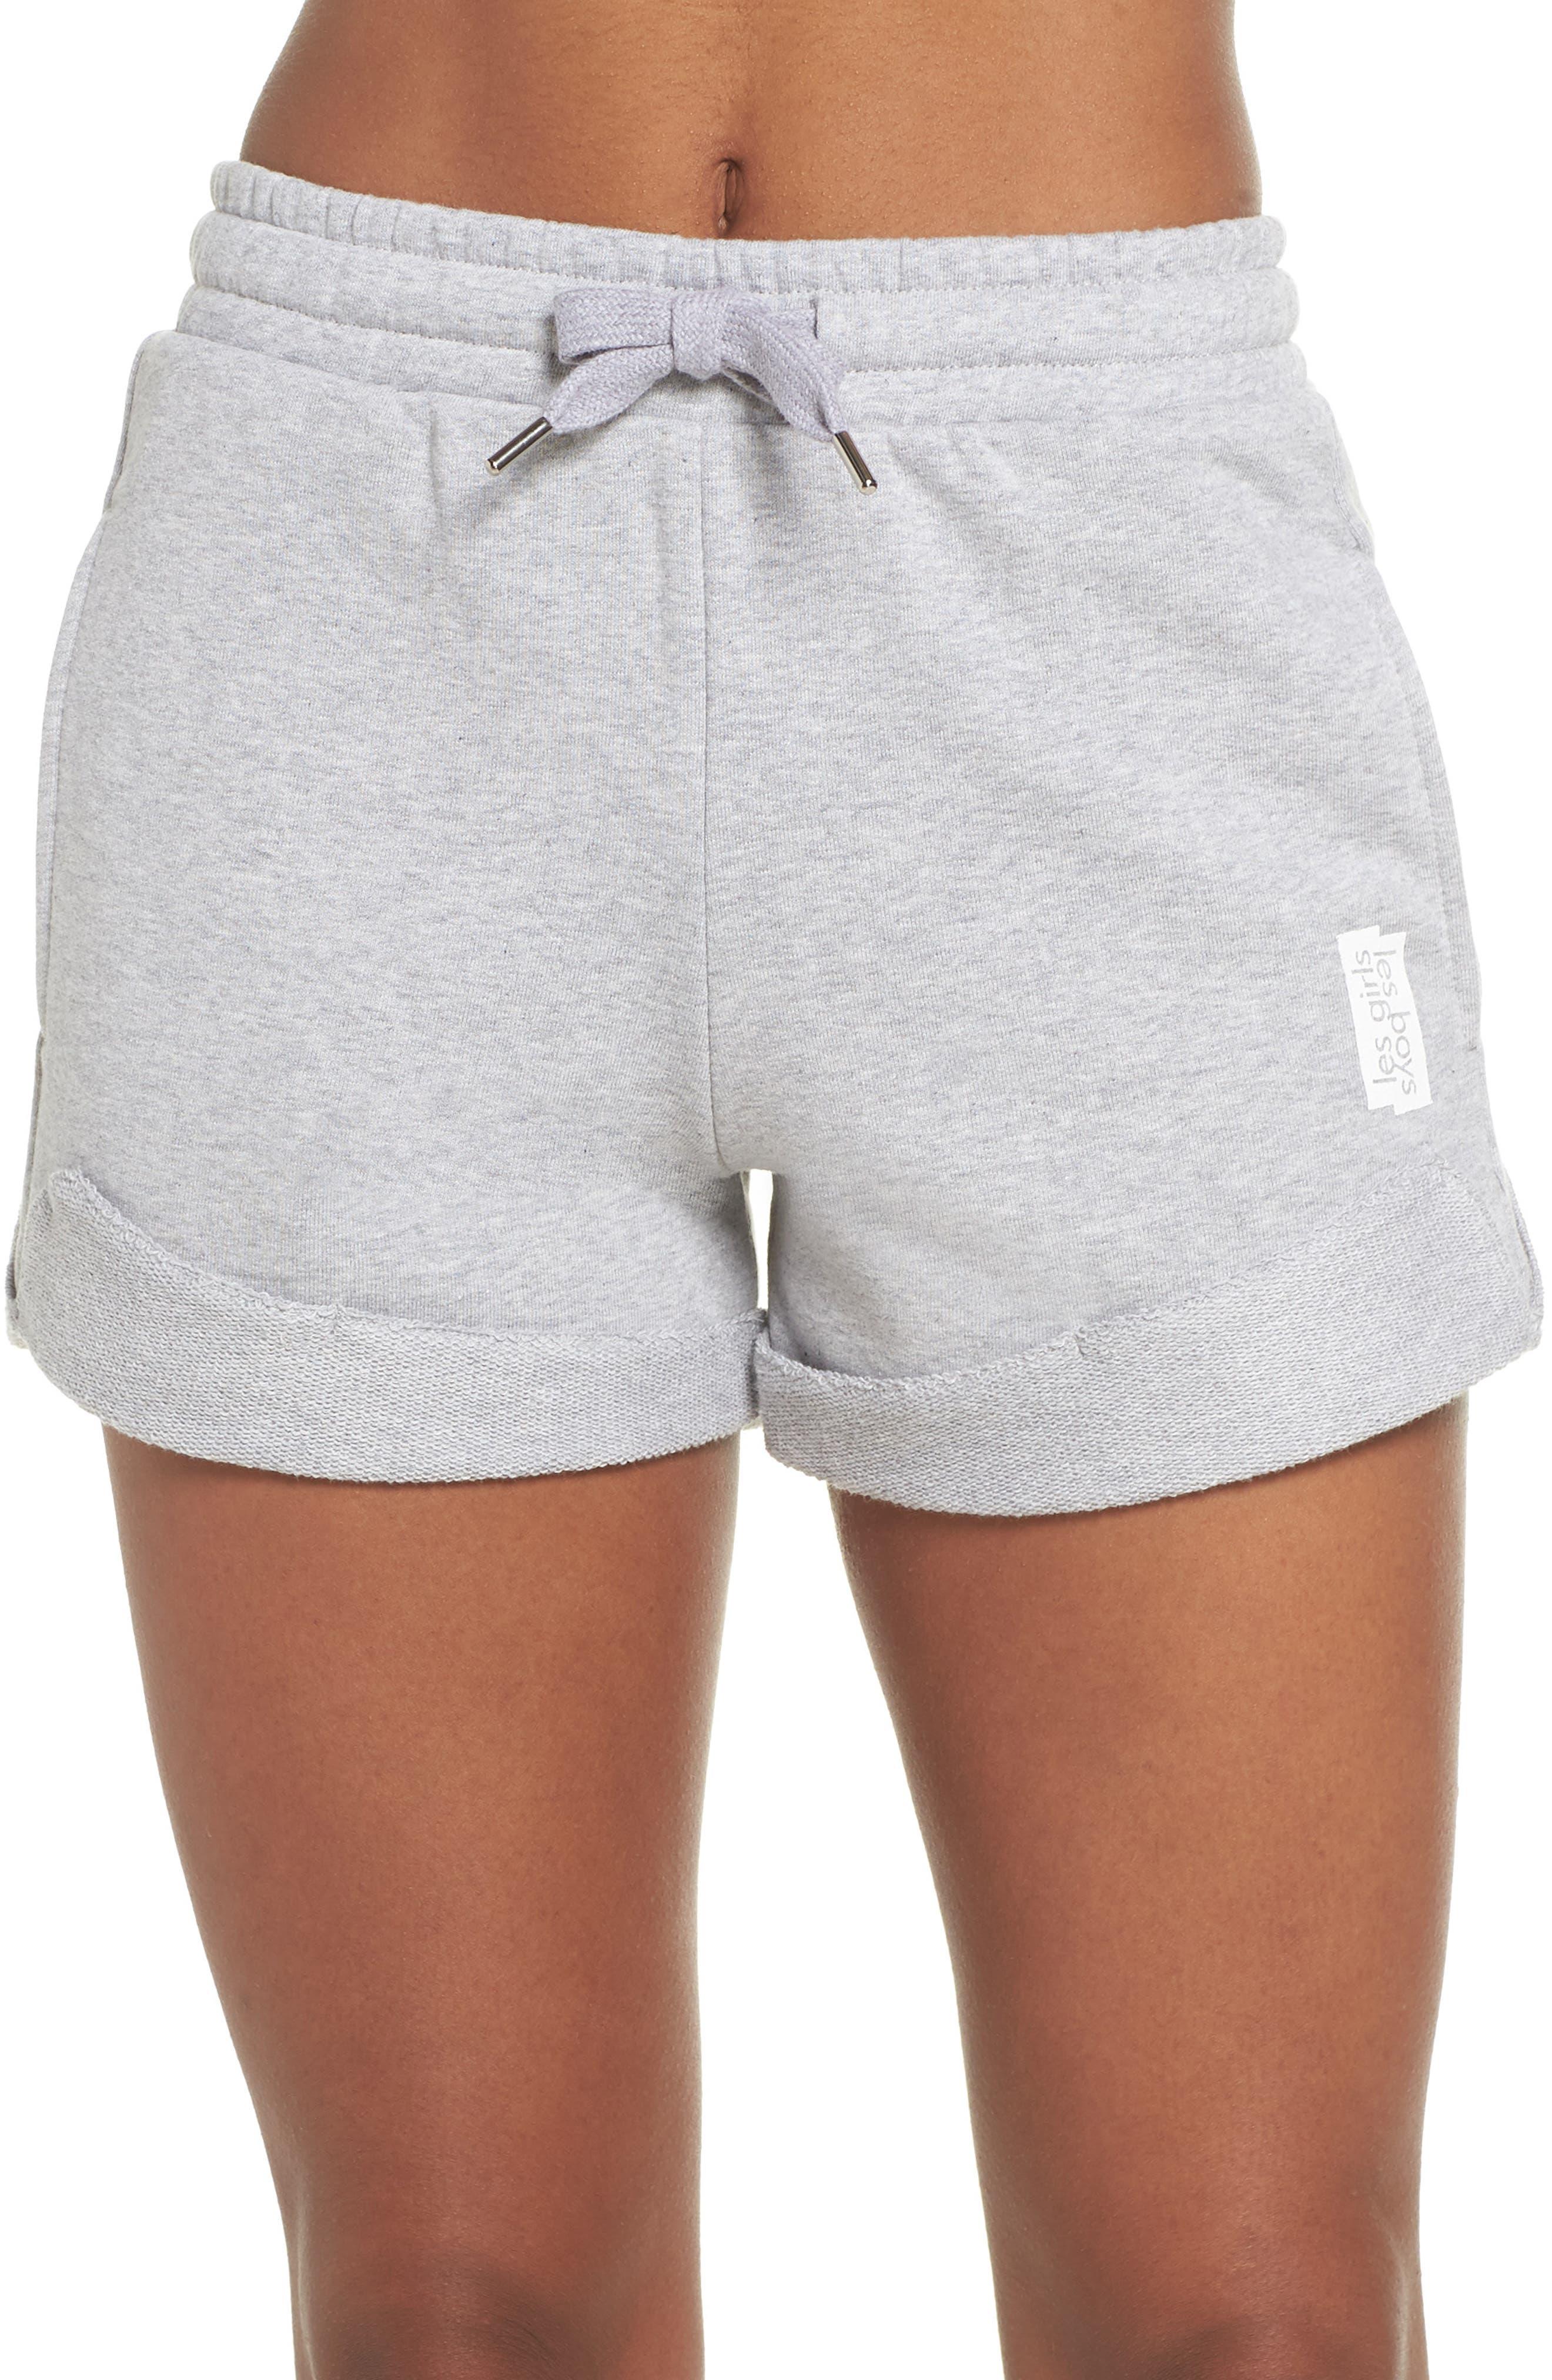 French Terry High Waist Shorts,                             Main thumbnail 1, color,                             020